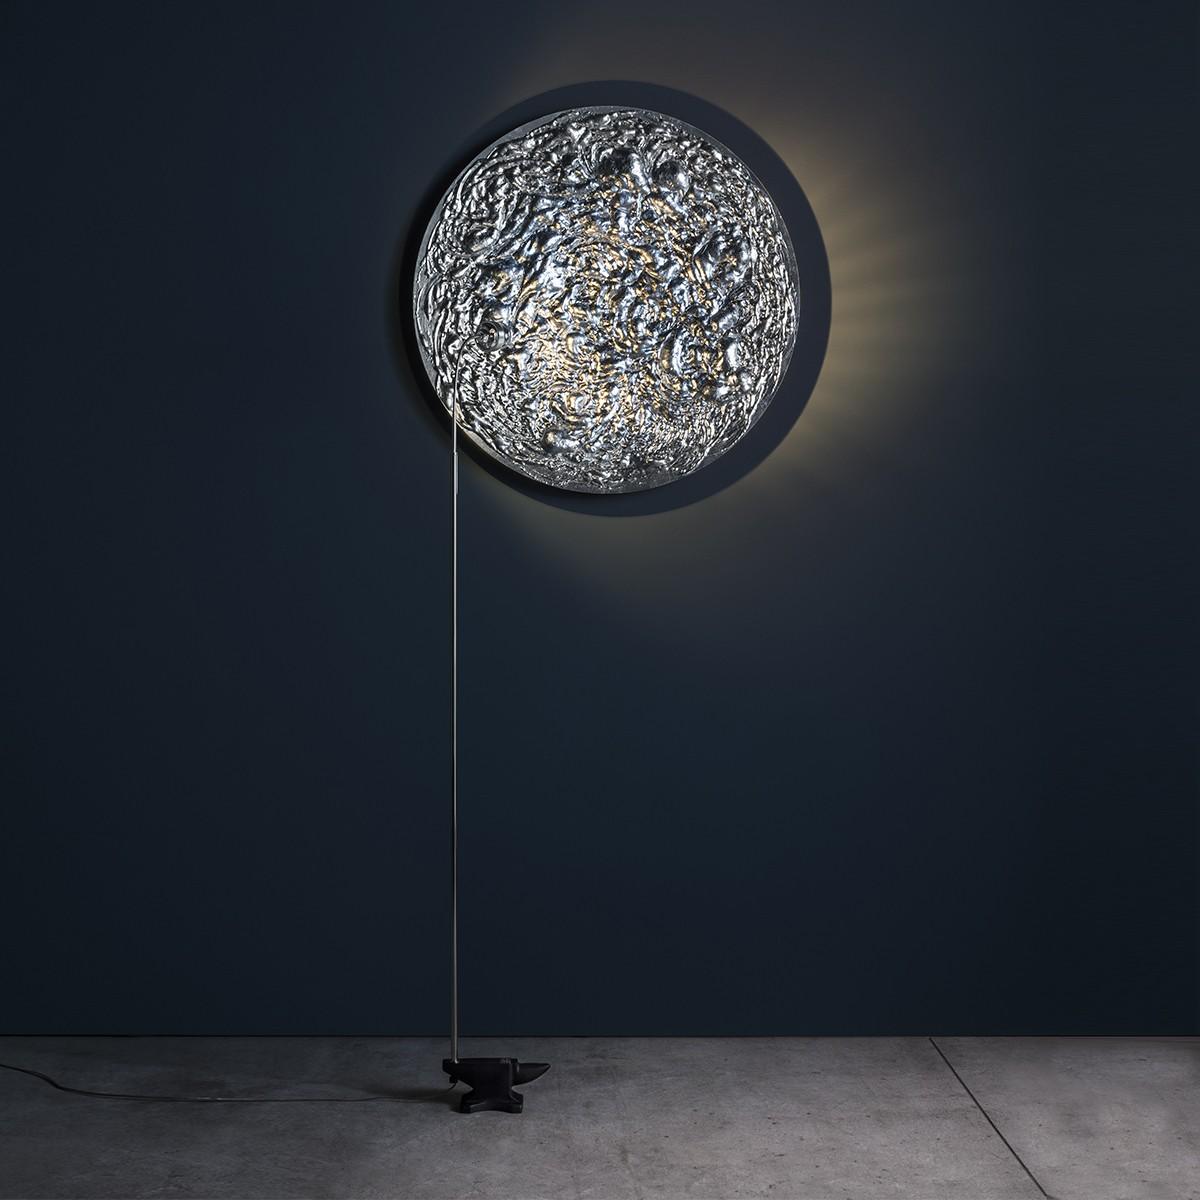 Catellani & Smith Stchu-Moon 08 Wand- / Stehleuchte, Ø: 80 cm, Aluminium / Silber